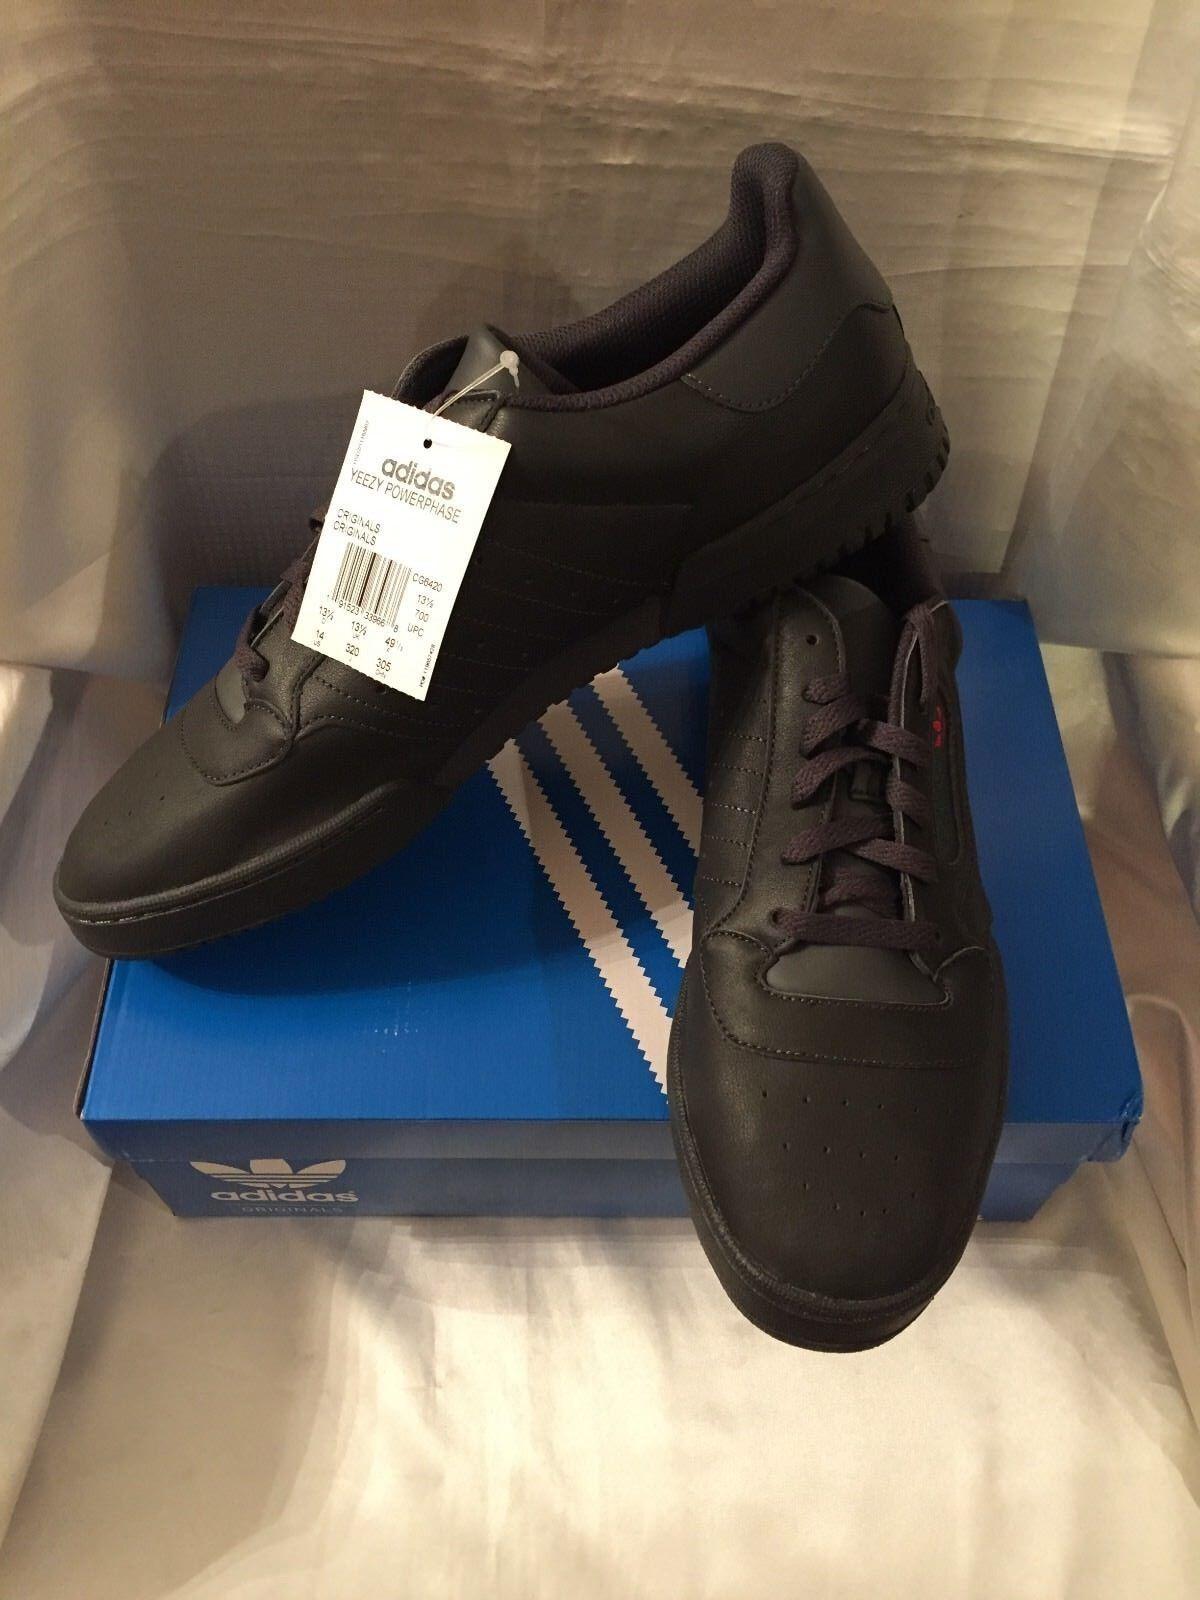 Adidas Adidas Adidas Yeezy Powerphase Calabasas Core Black CG6420 - Men's Size 14 NIB 3c401d